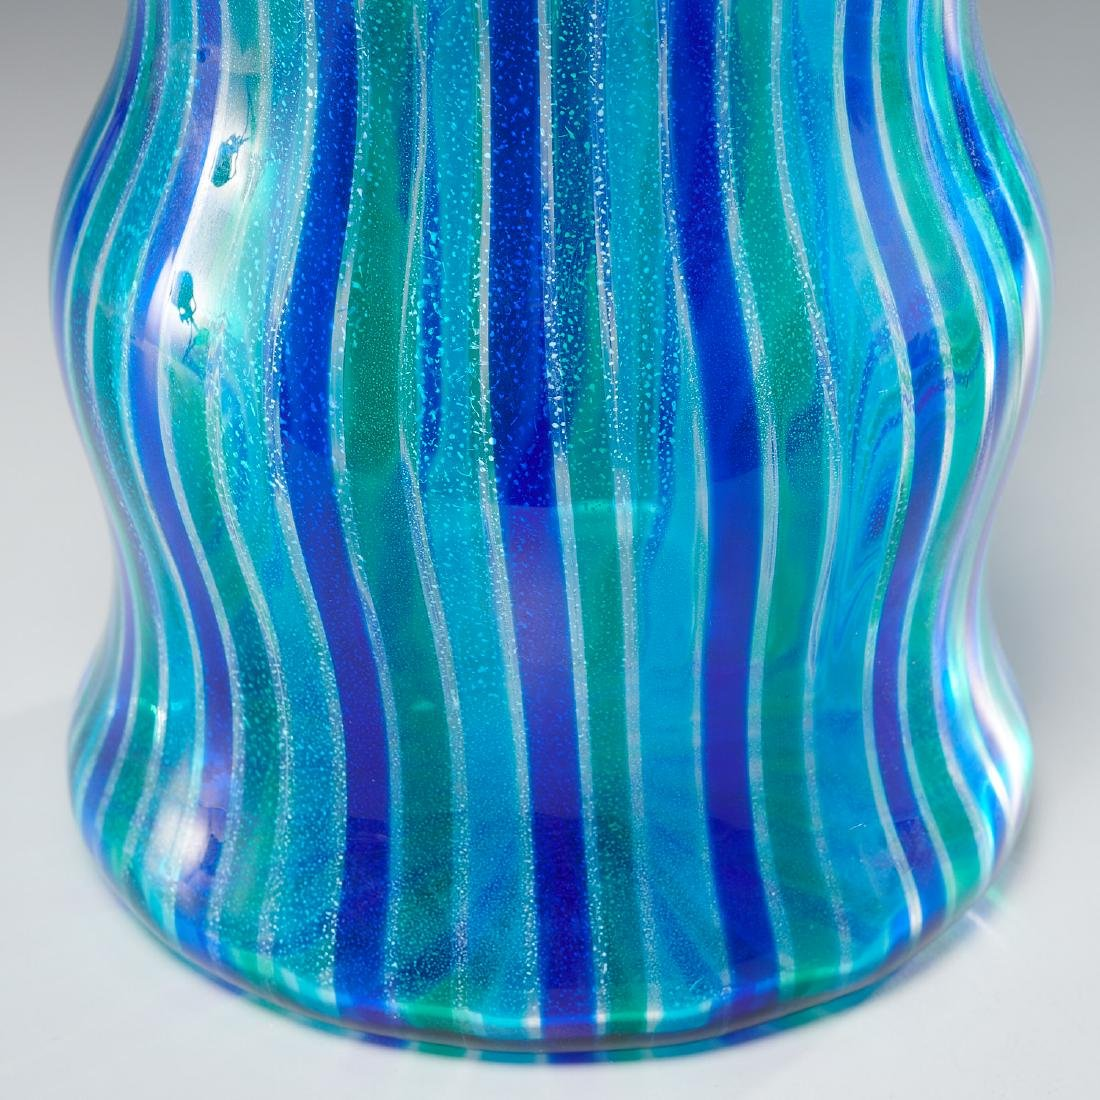 Alessandro Mendini 'Arado' vase for Venini - 3